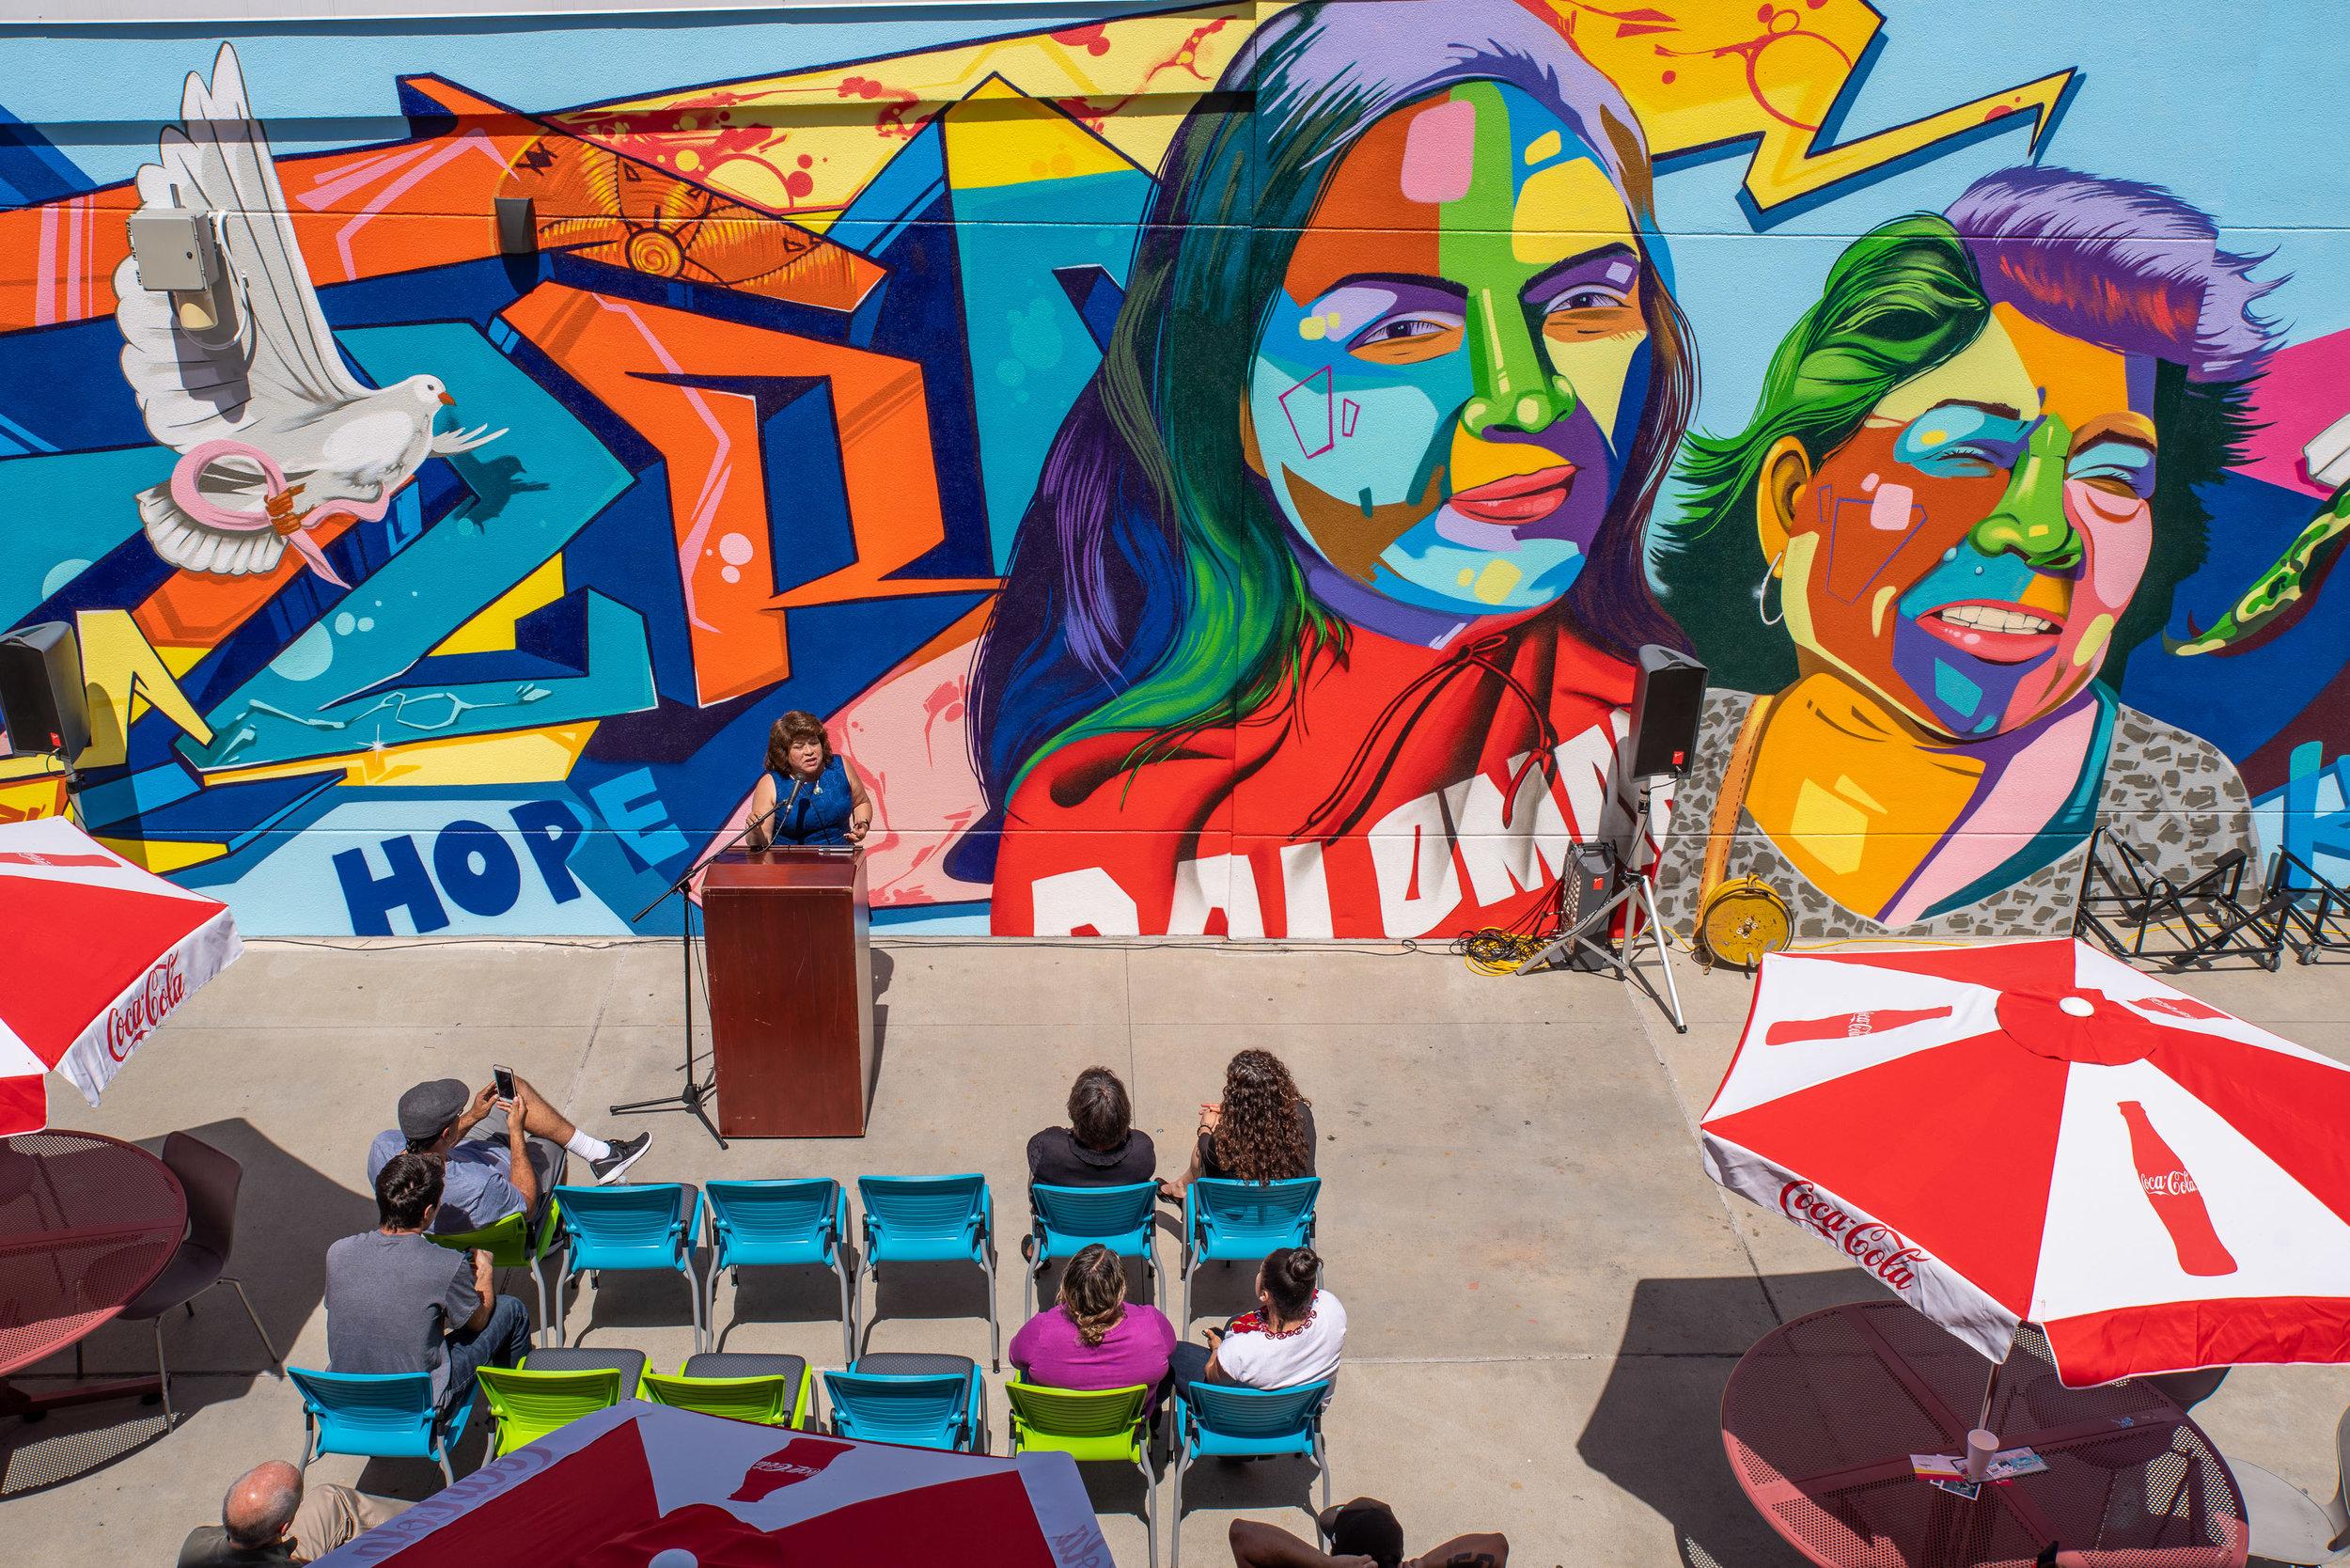 2019-05-14-man-one-mural-k-1-imgp2436_47075355984_o.jpg